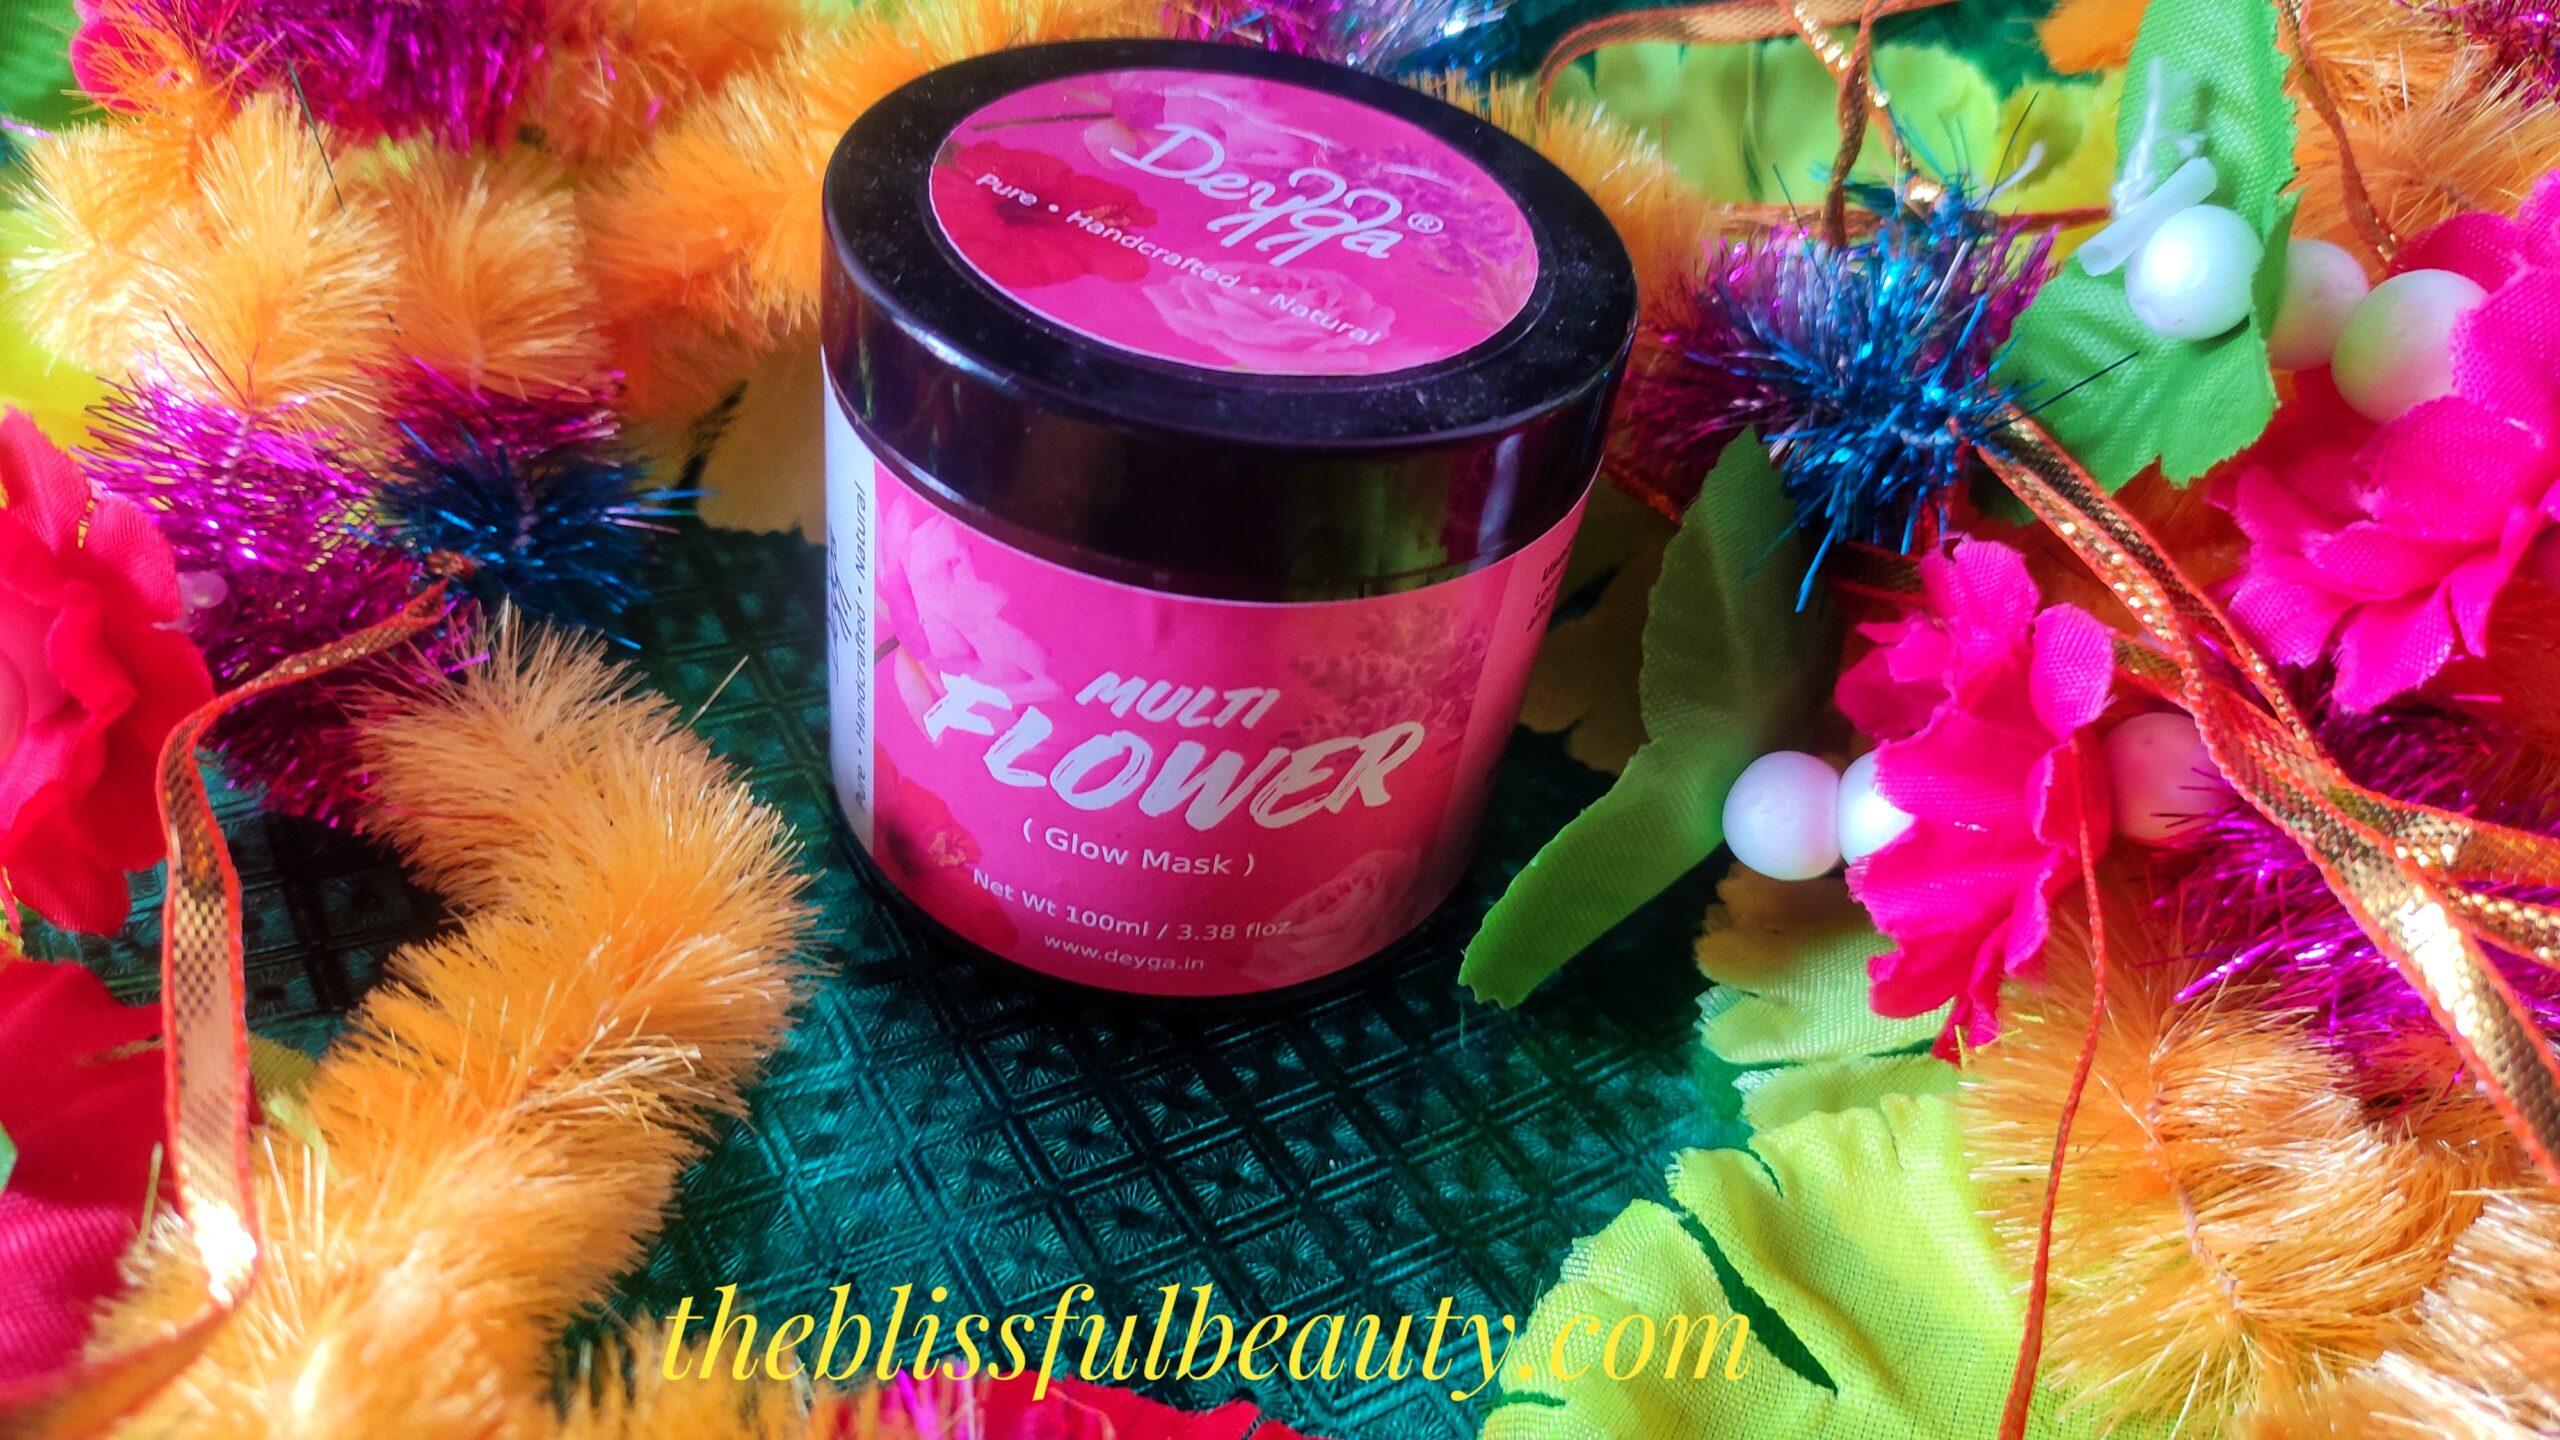 Deyga Multiflower Glow mask Review